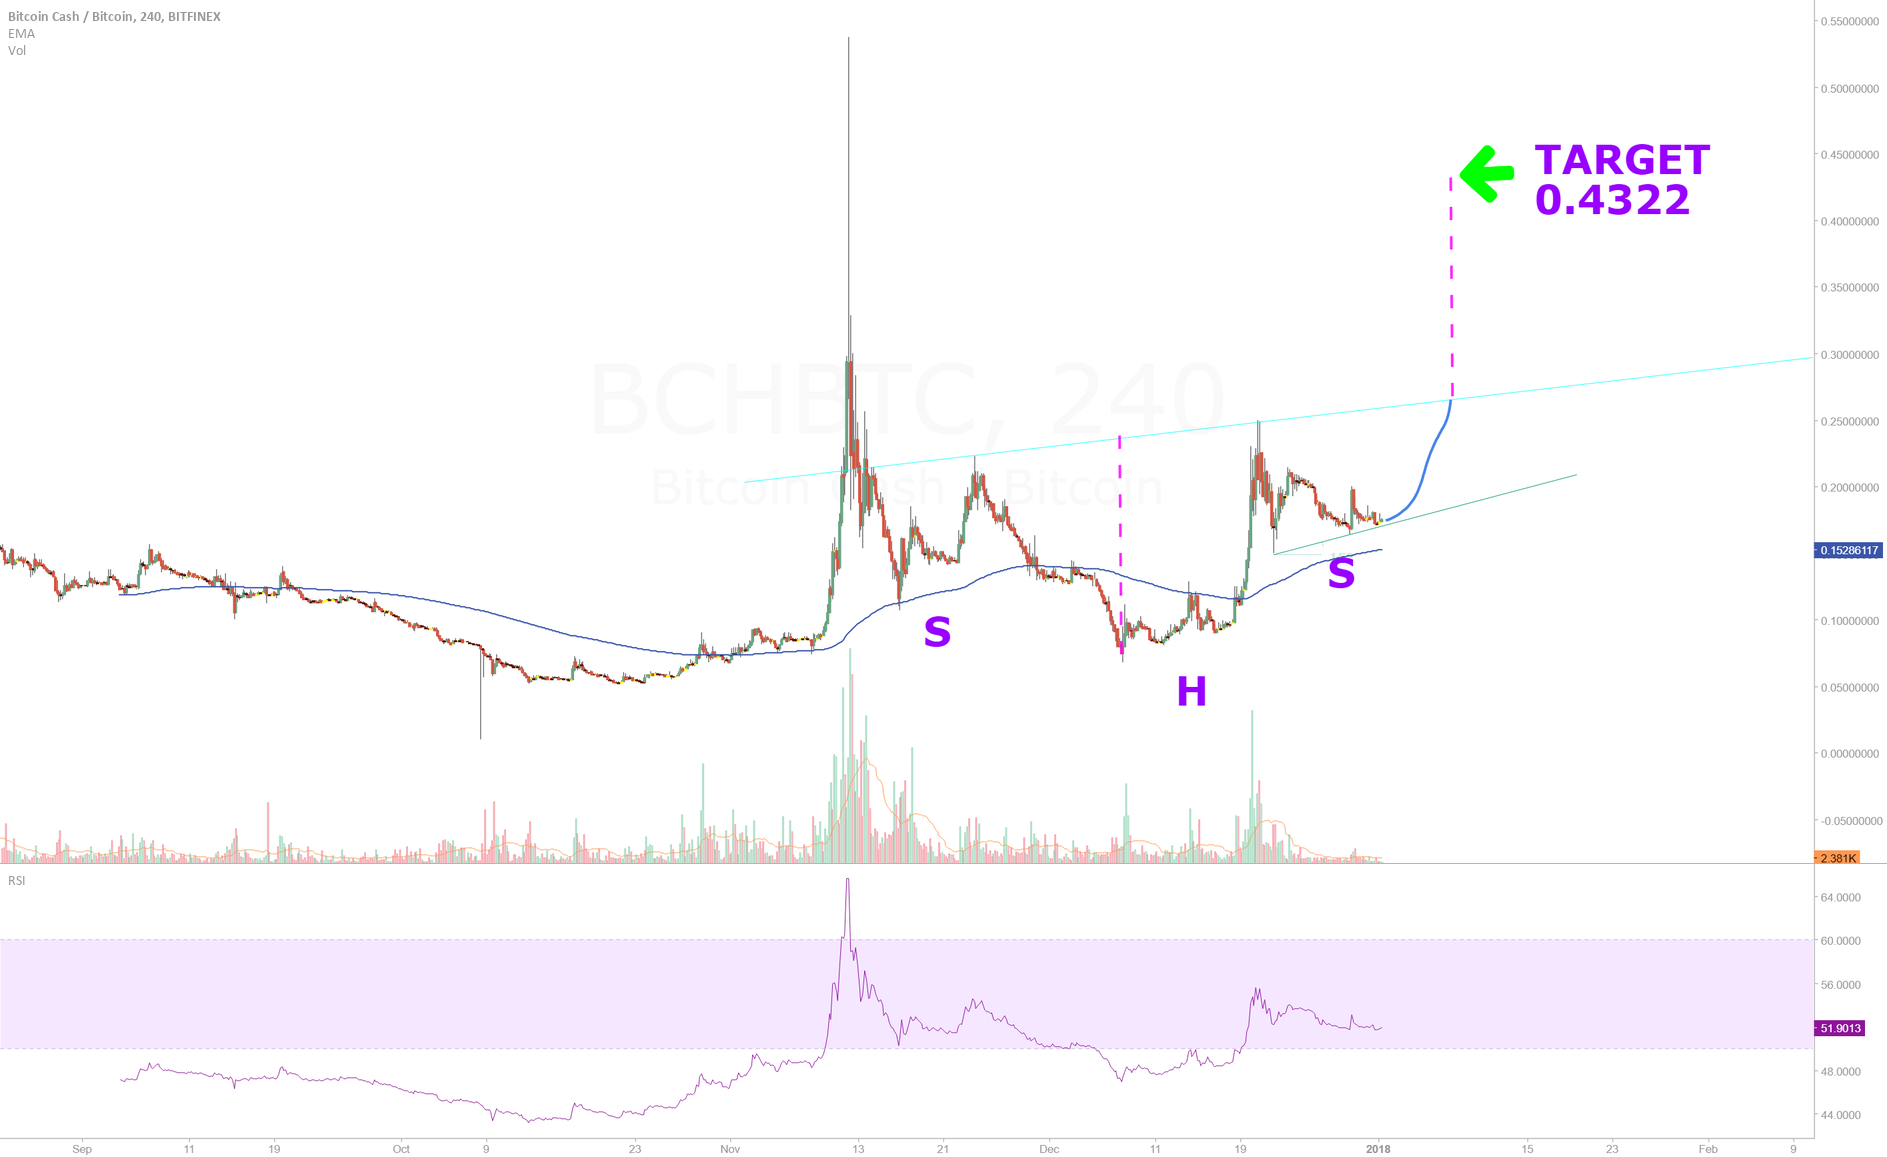 BCH about to moon (READ DESCRIPTION)